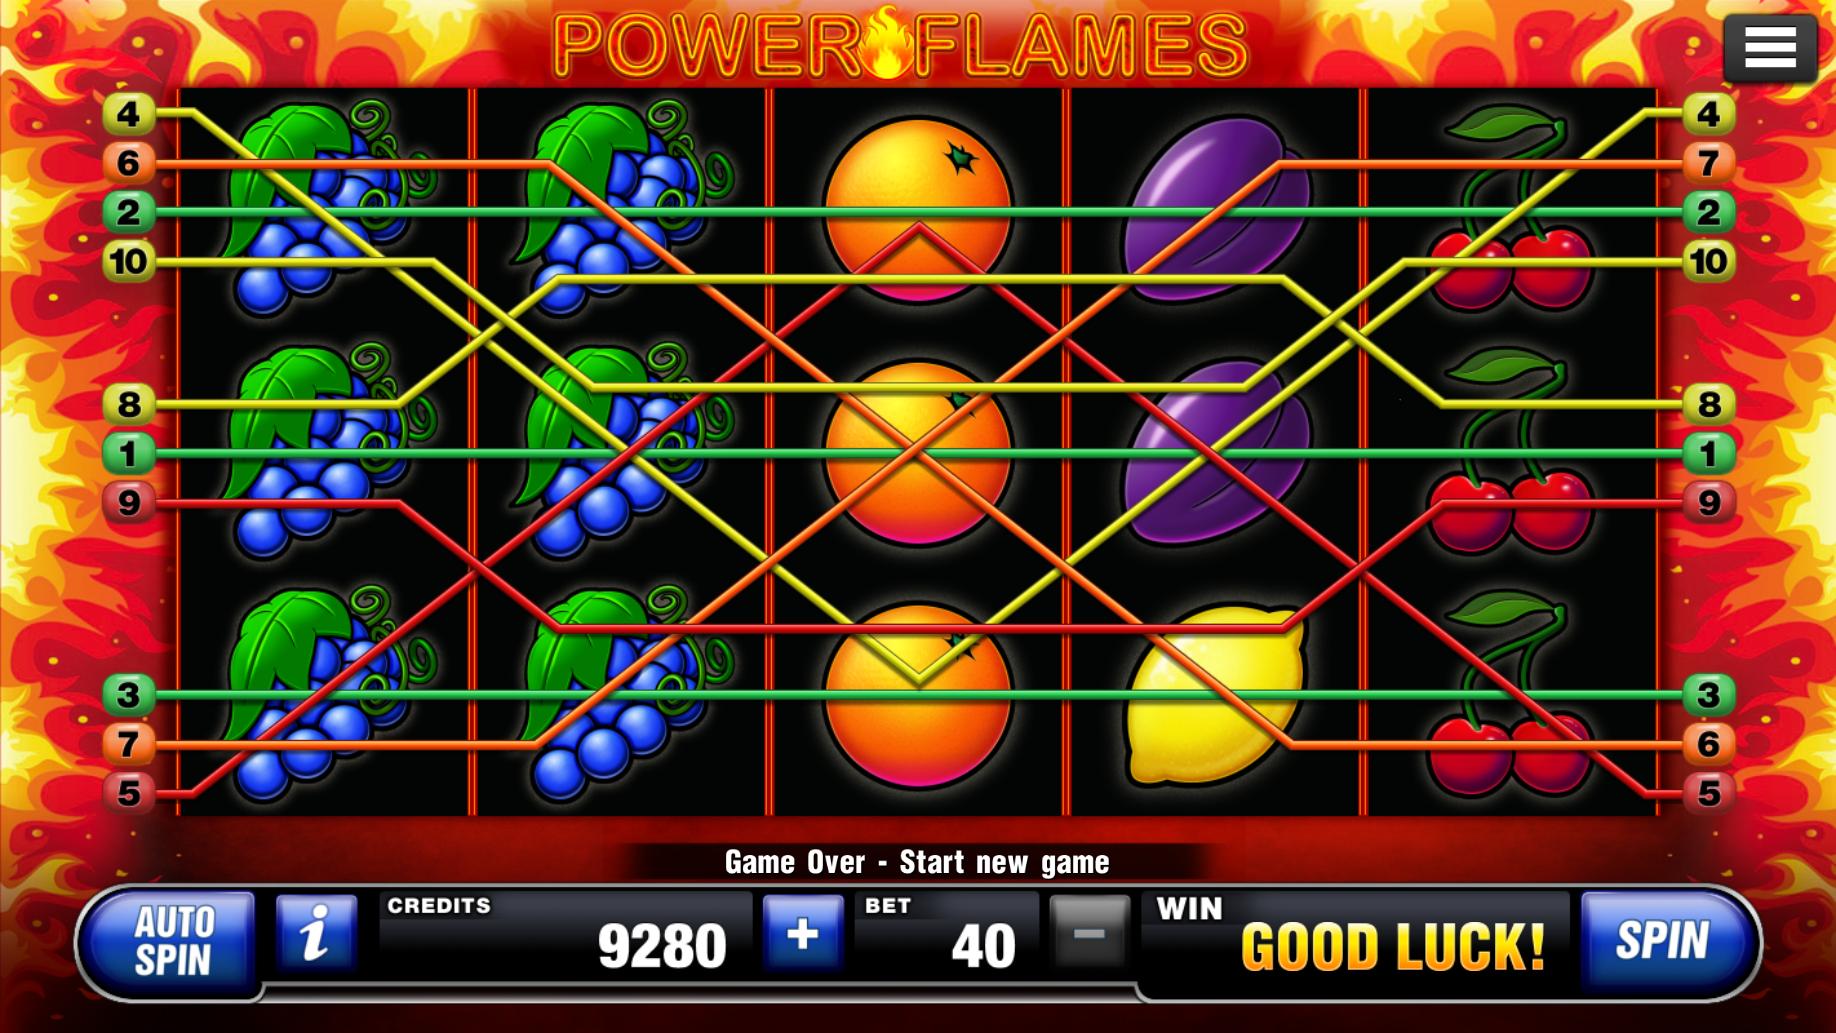 Power Flames Slot